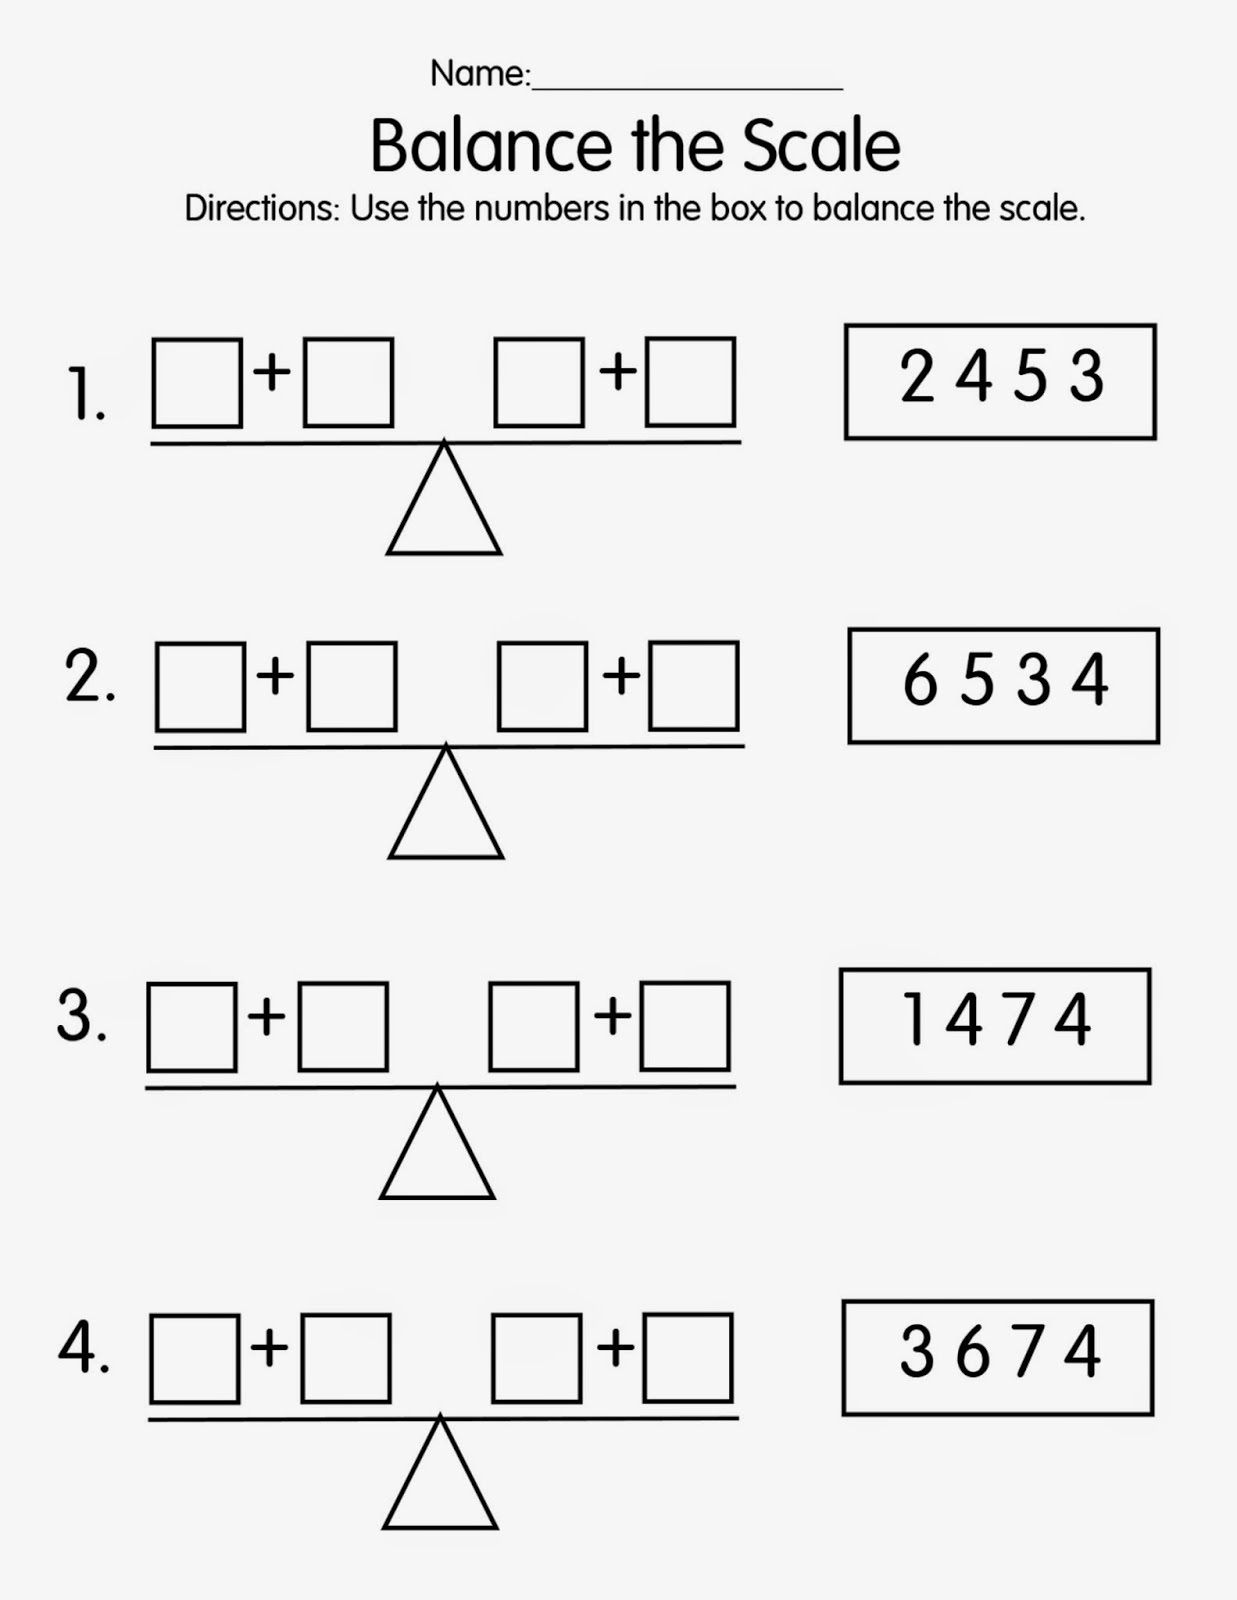 Balance Scale Worksheets for Children | Activity Shelter | Math ...